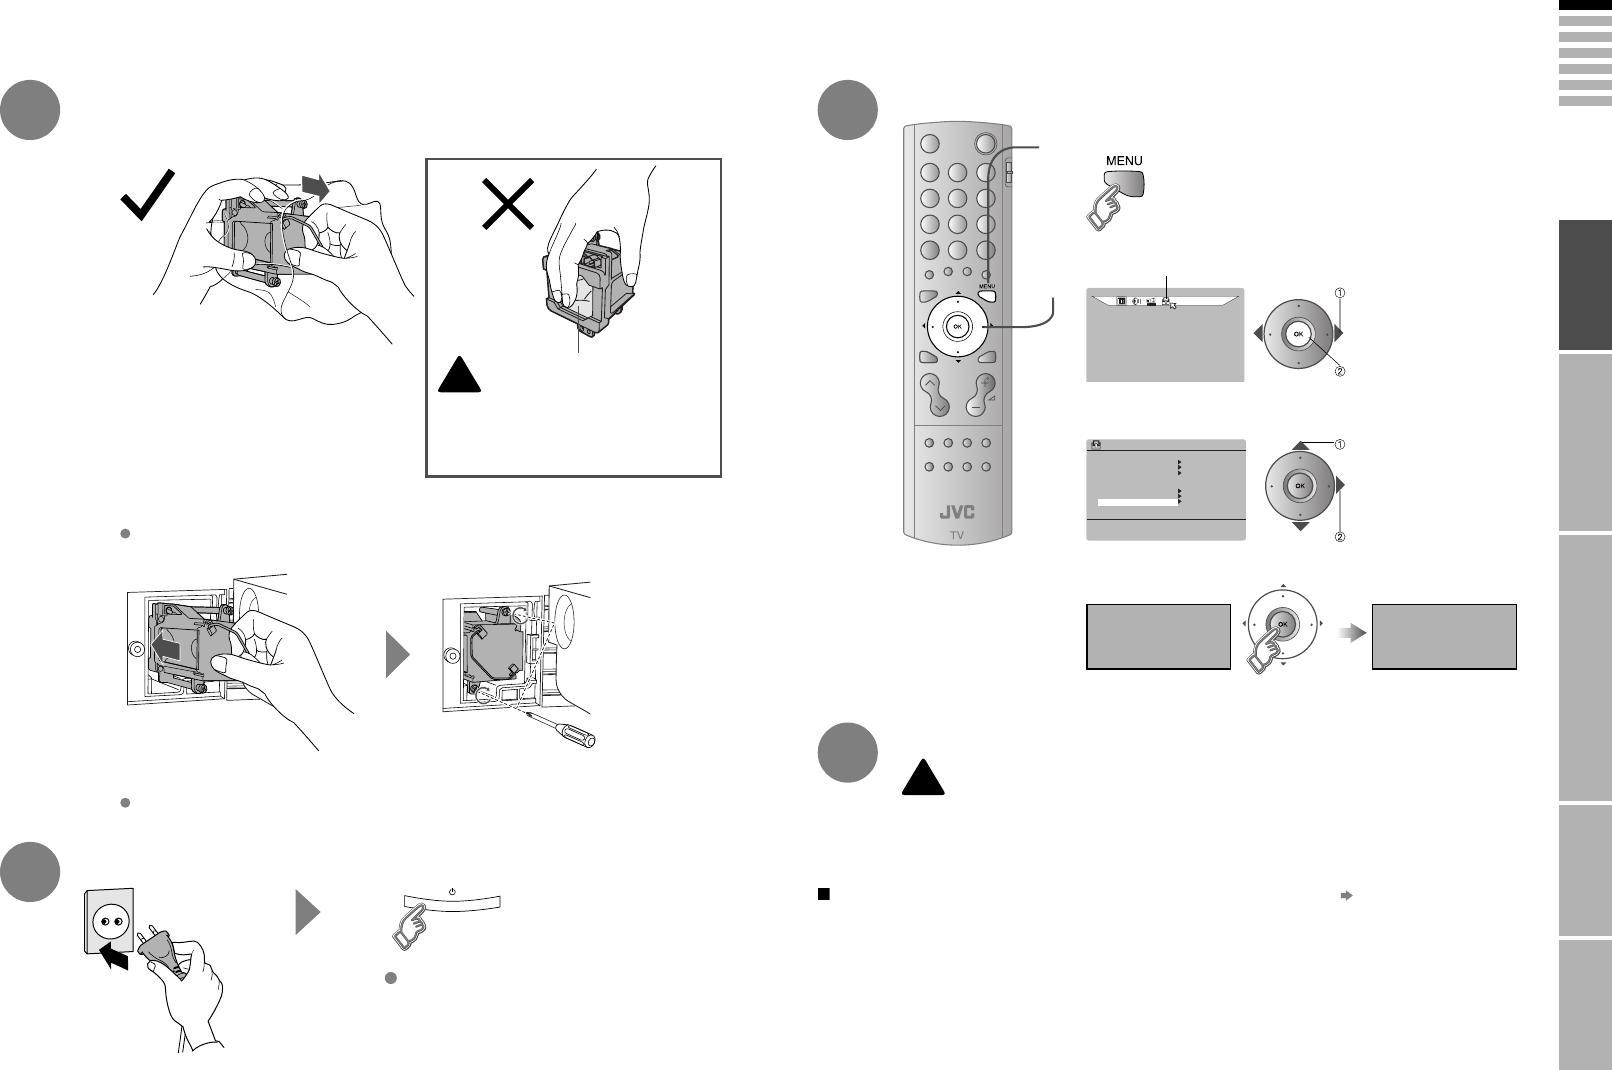 Handleiding JVC HD-70ZR7 (pagina 7 van 26) (English)